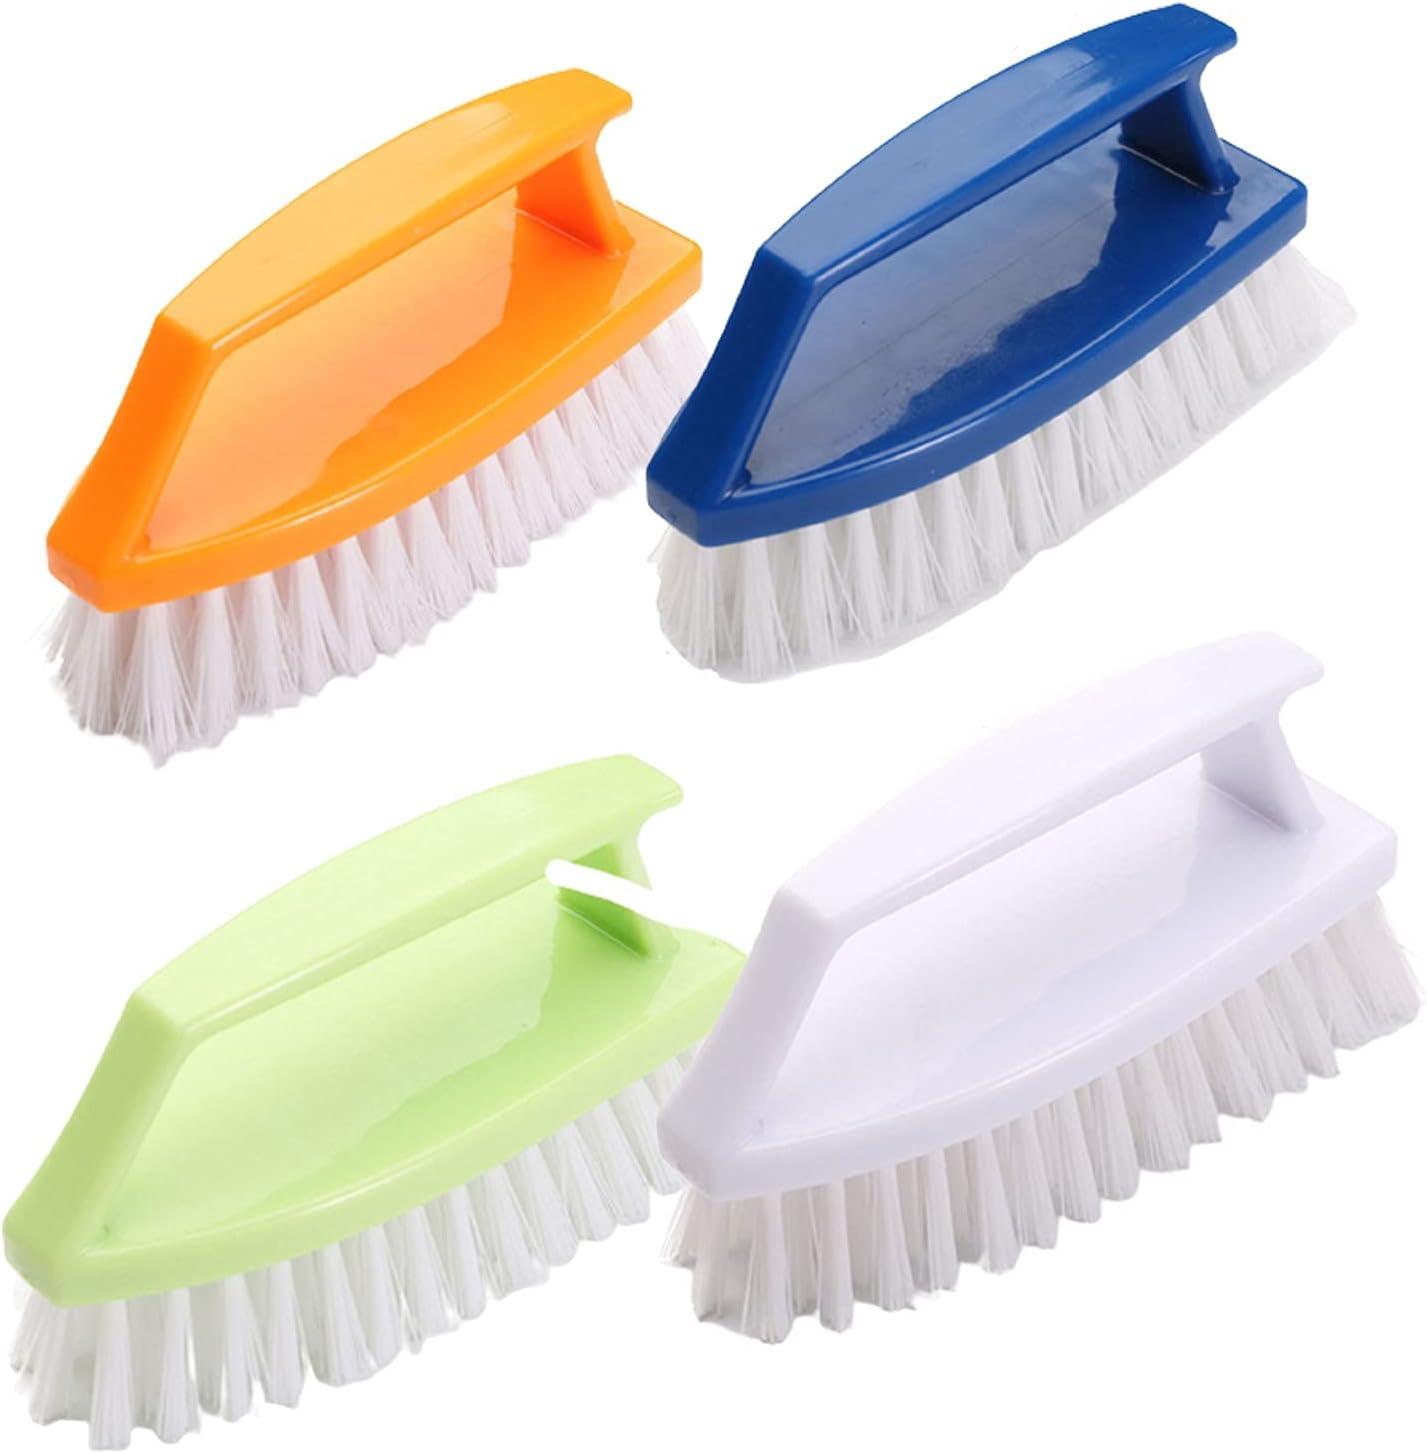 Super sale period limited Ranking TOP12 Multifunctional Hard-bristled Plastic Brush Hard-brist Powerful